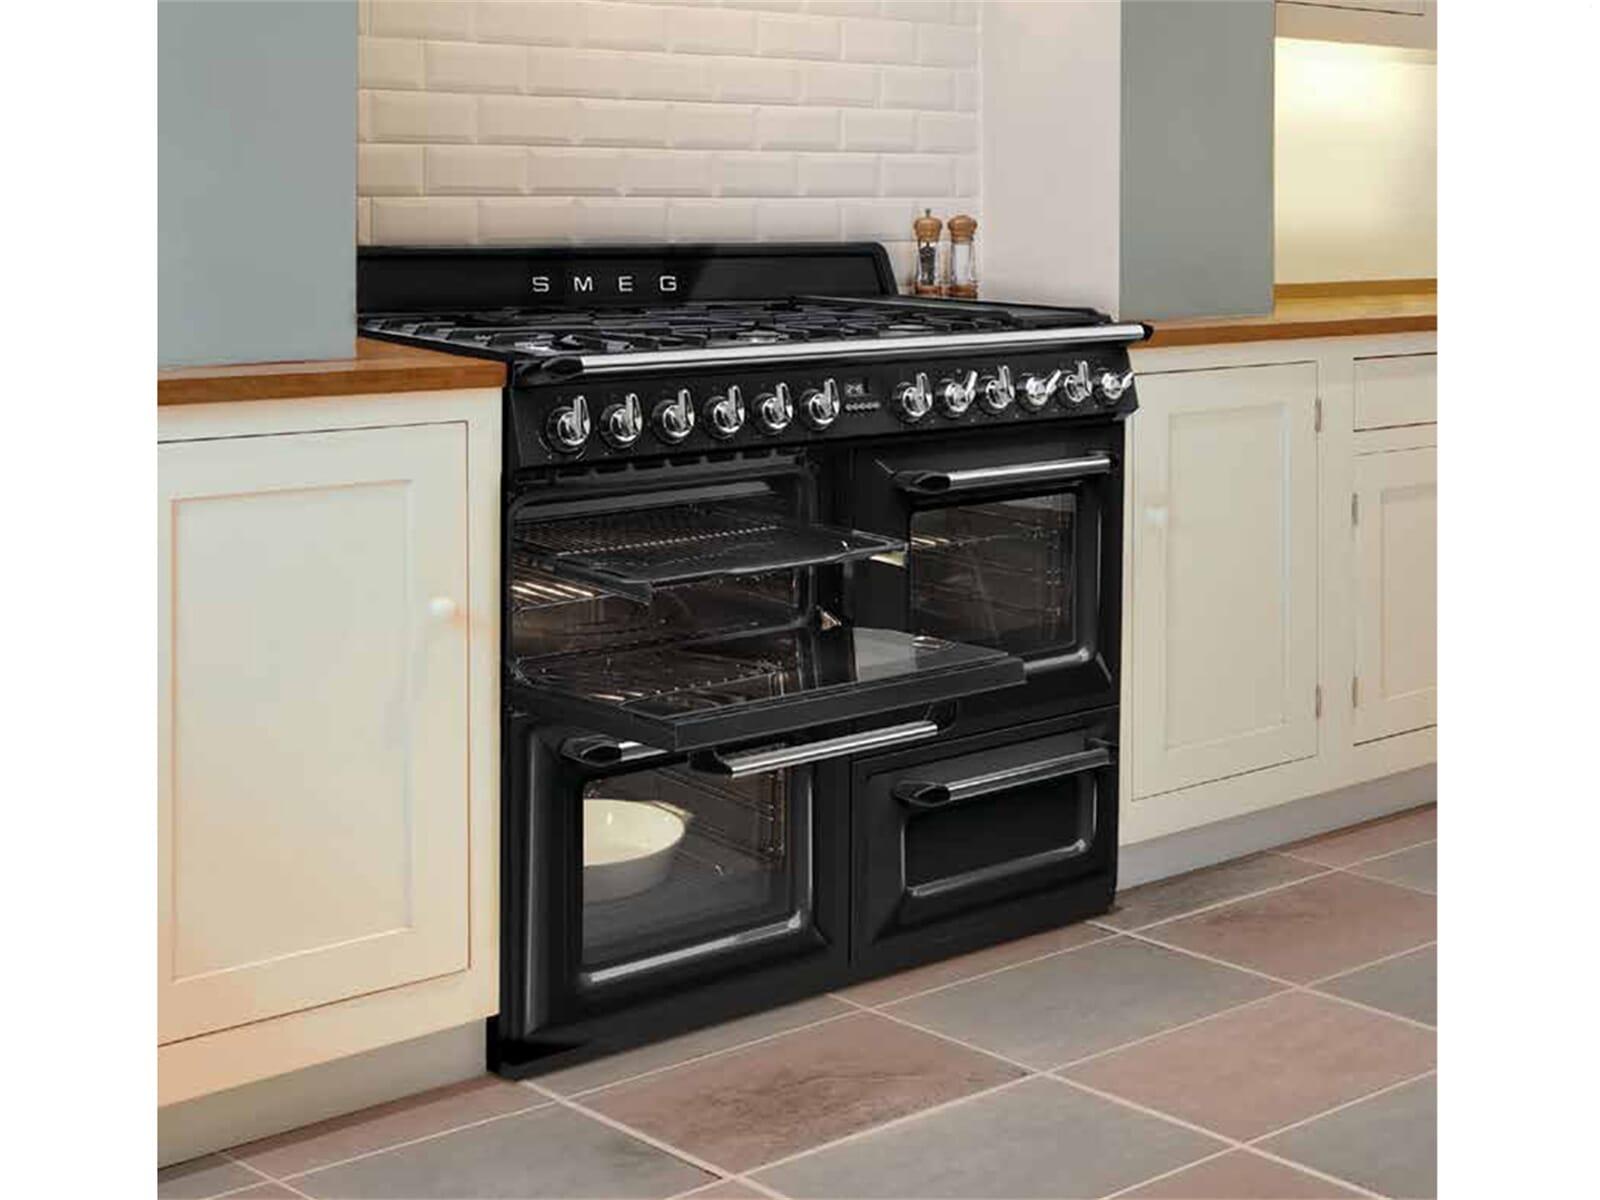 Smeg Kühlschrank Creme Gebraucht : Smeg kühlschrank creme gebraucht gas elektroherd kombination gas